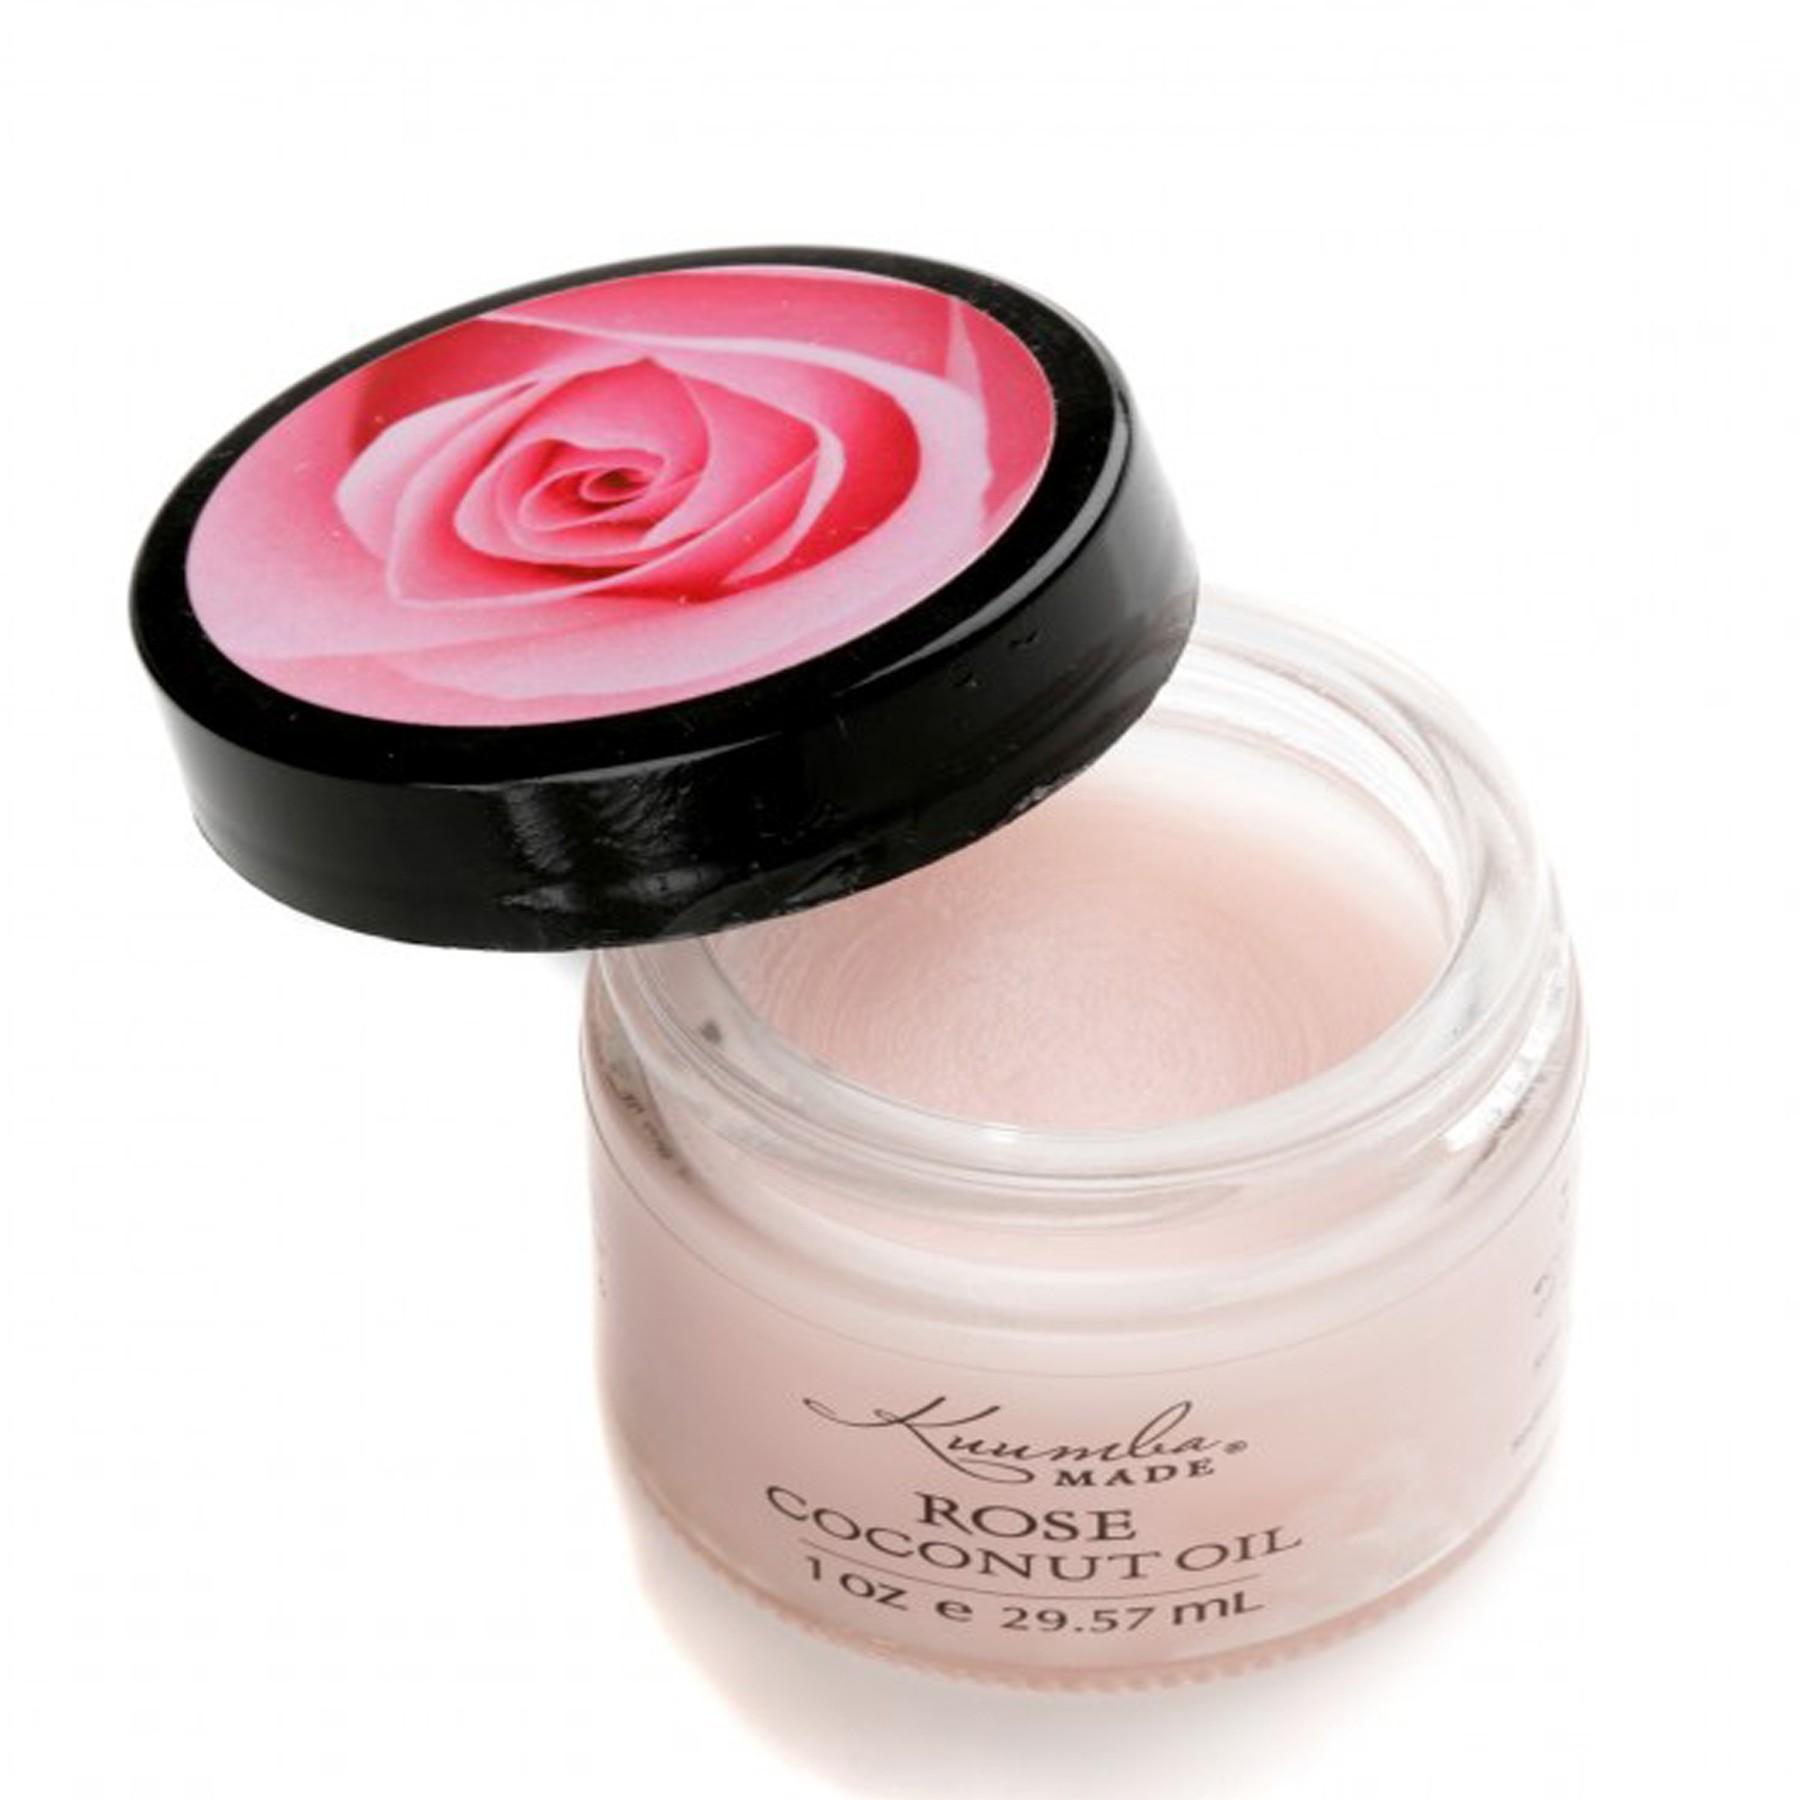 Kuumba Made Organic Rose Coconut Oil